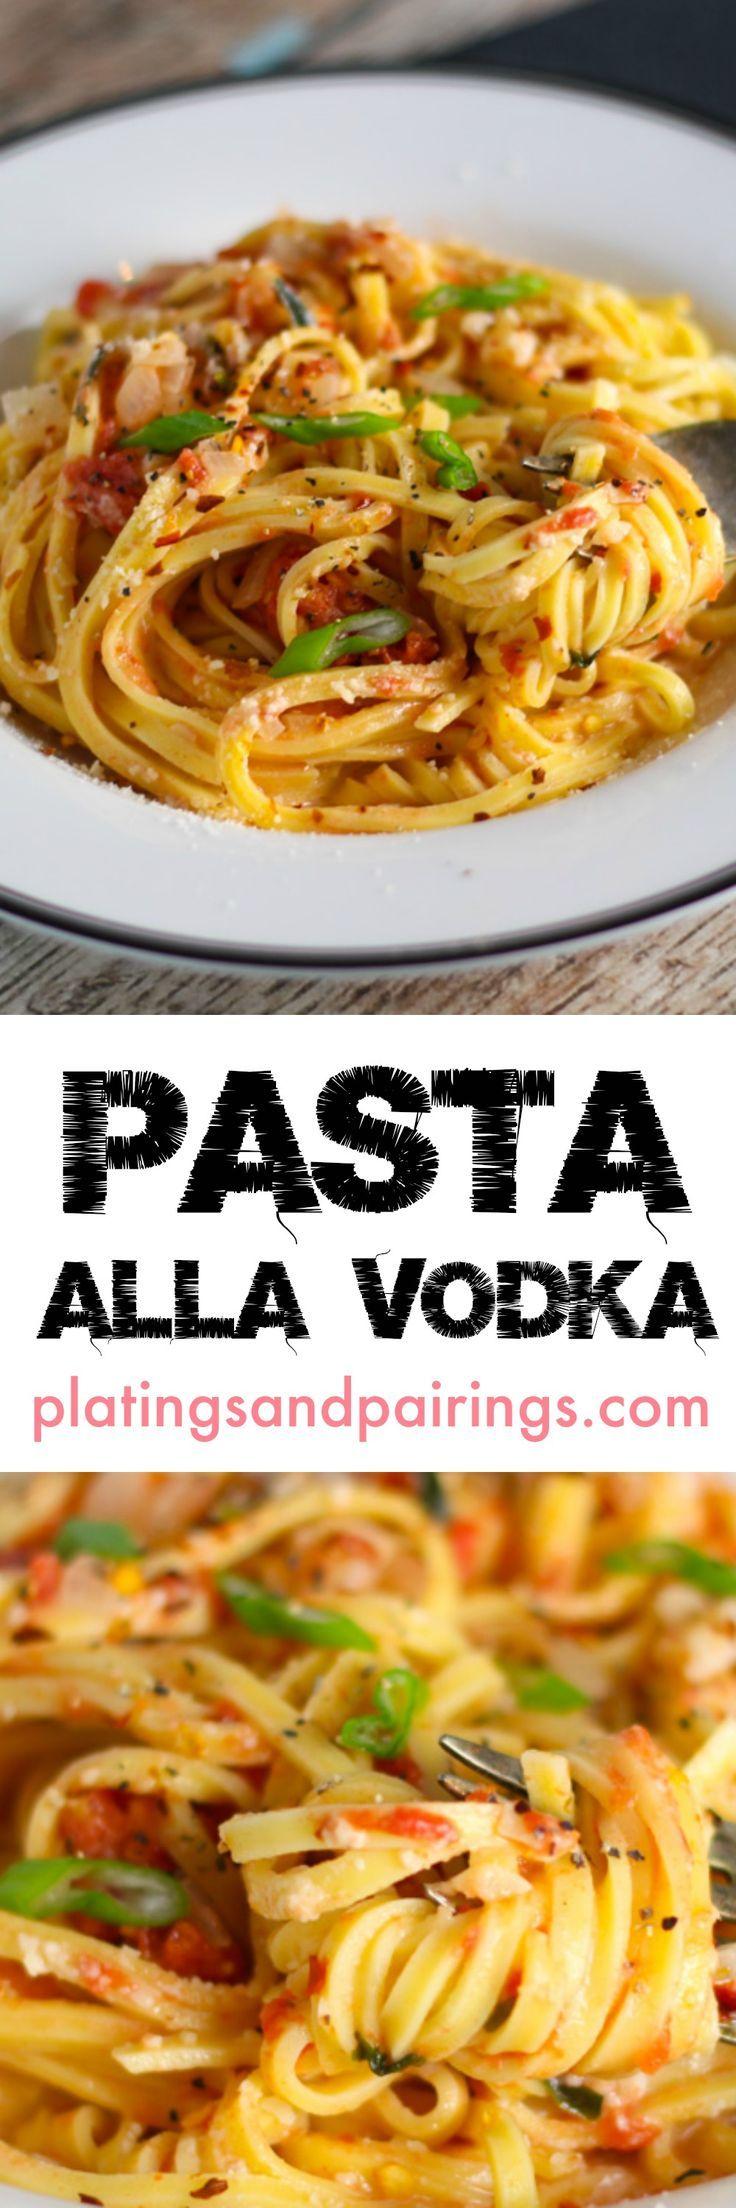 PASTA ALLA VODKA recipe! Delicious! Creamy, tomatoey, cheesy goodness ...thats easy to make & ready in just 30 minutes! #pasta #vodka